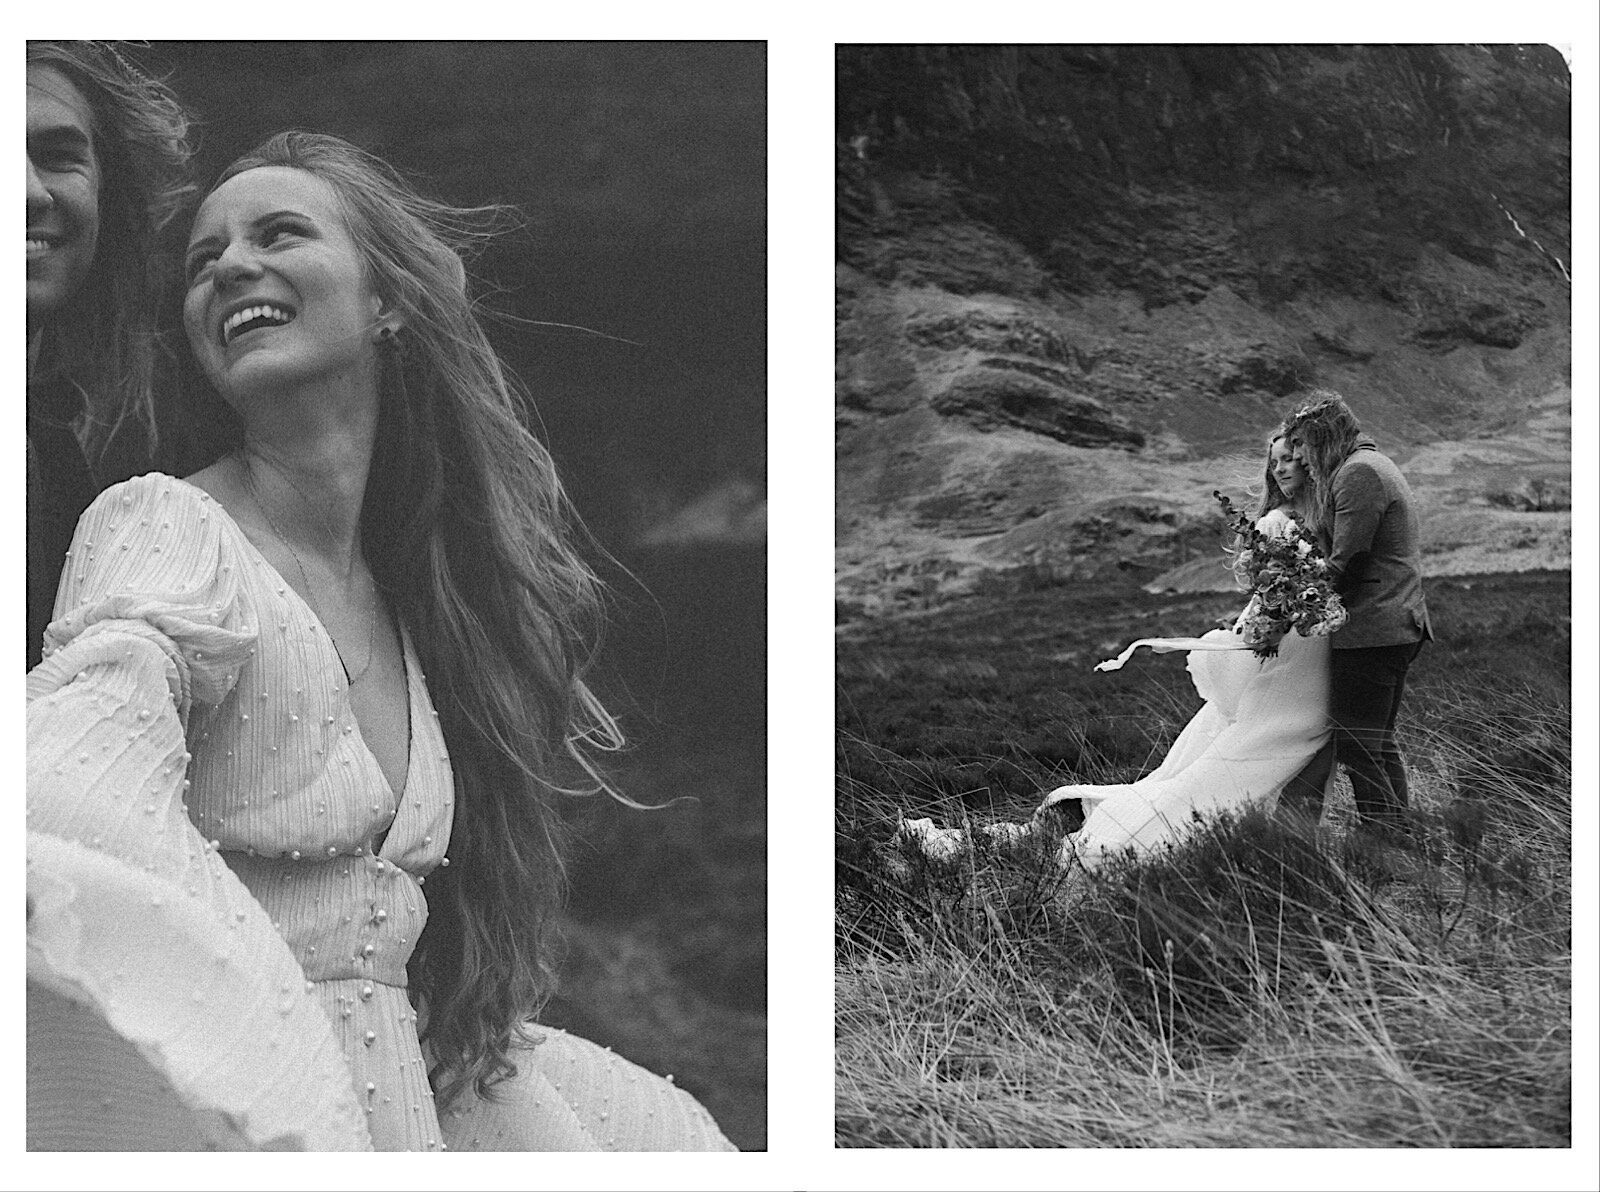 19_scotland_couple_shoot_lety_photography (36 von 39)_scotland_couple_shoot_lety_photography (22 von 39).jpg